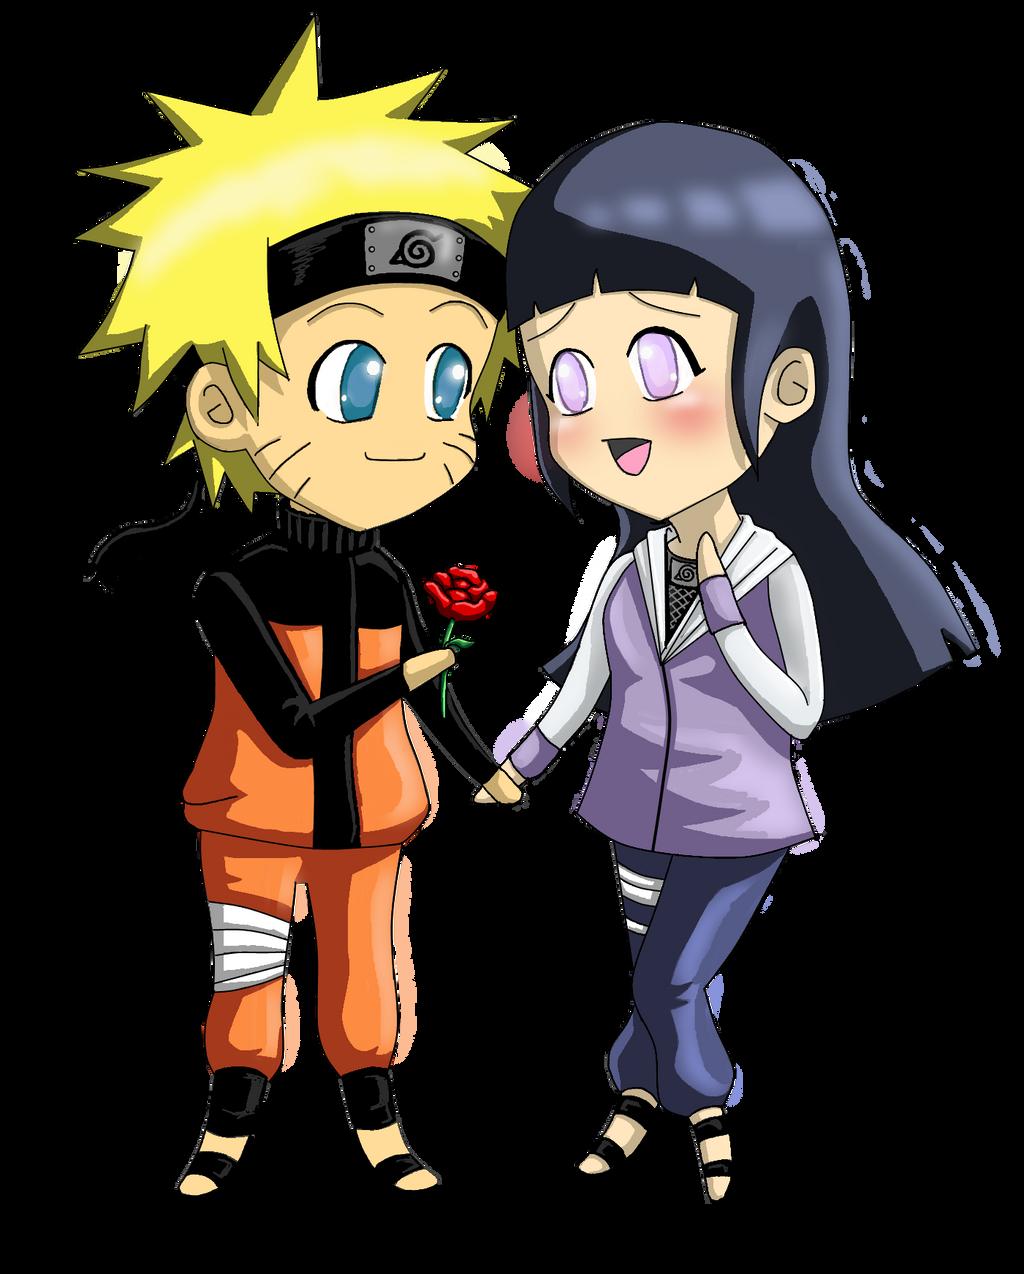 I love you-Chibi by michael0730 on DeviantArt  |Chibi Love Anime